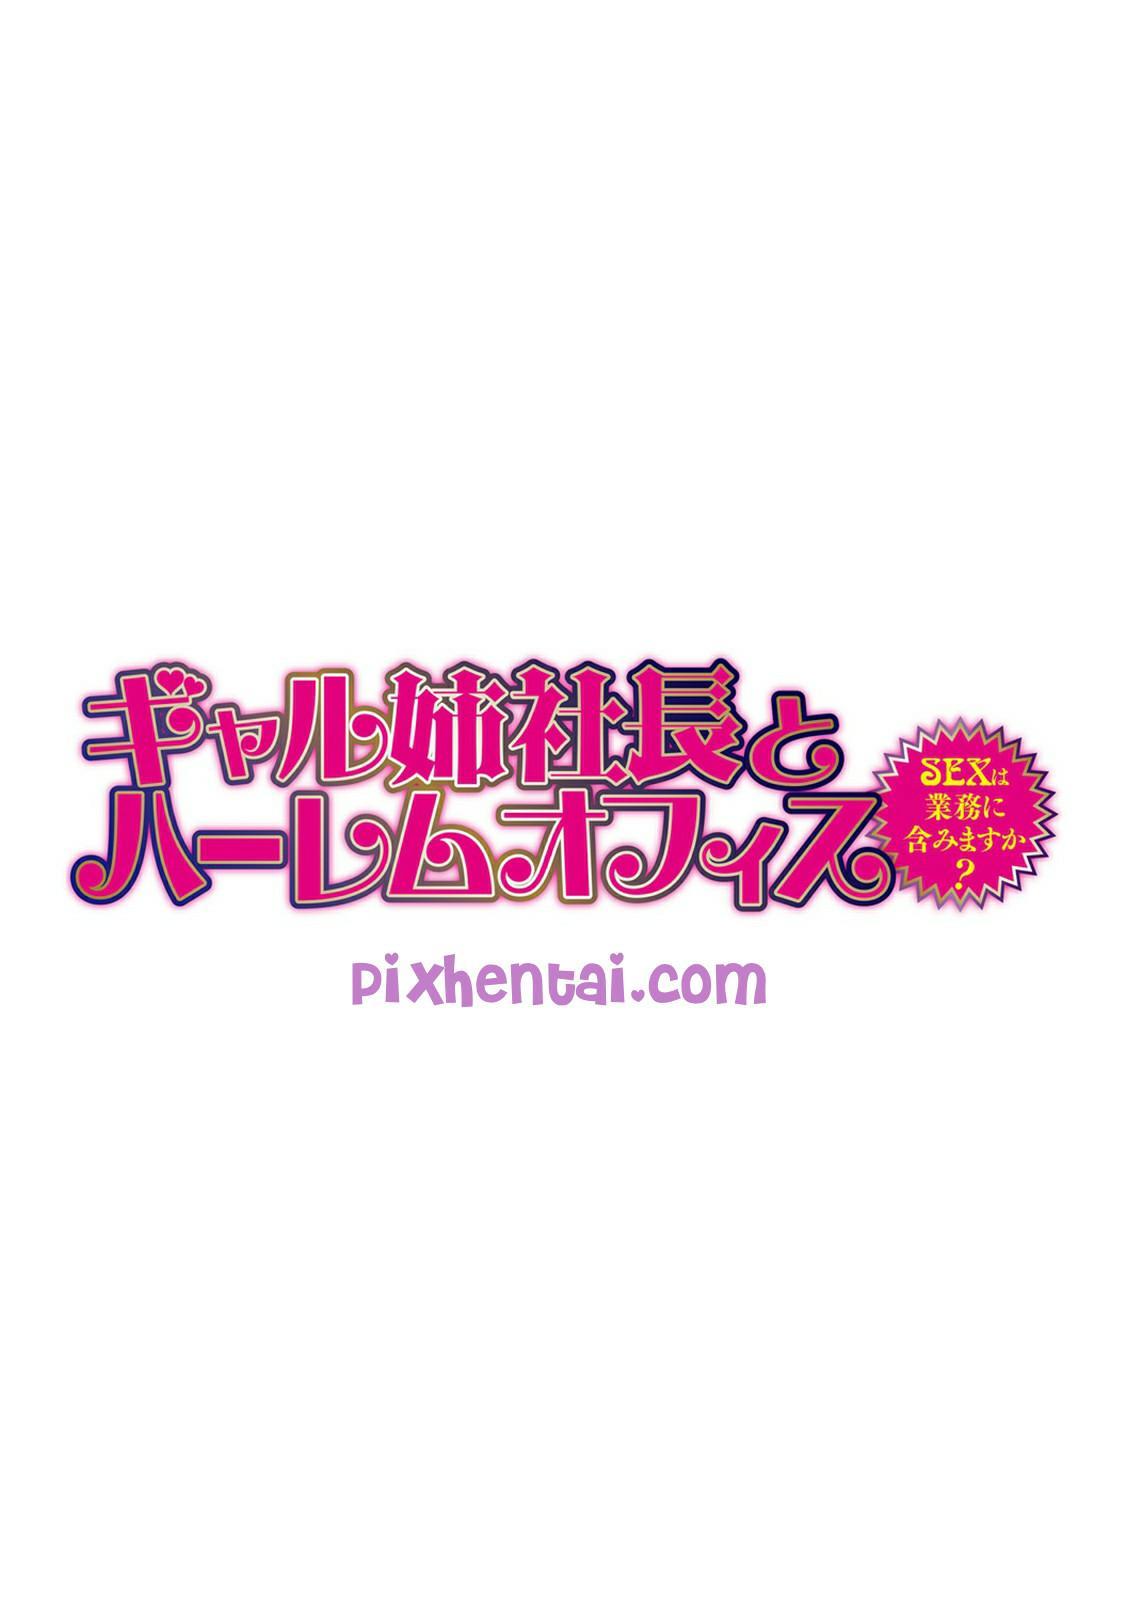 Komik Hentai Diajak Ngesex Direktur Montok Manga XXX Porn Doujin Sex Bokep 05